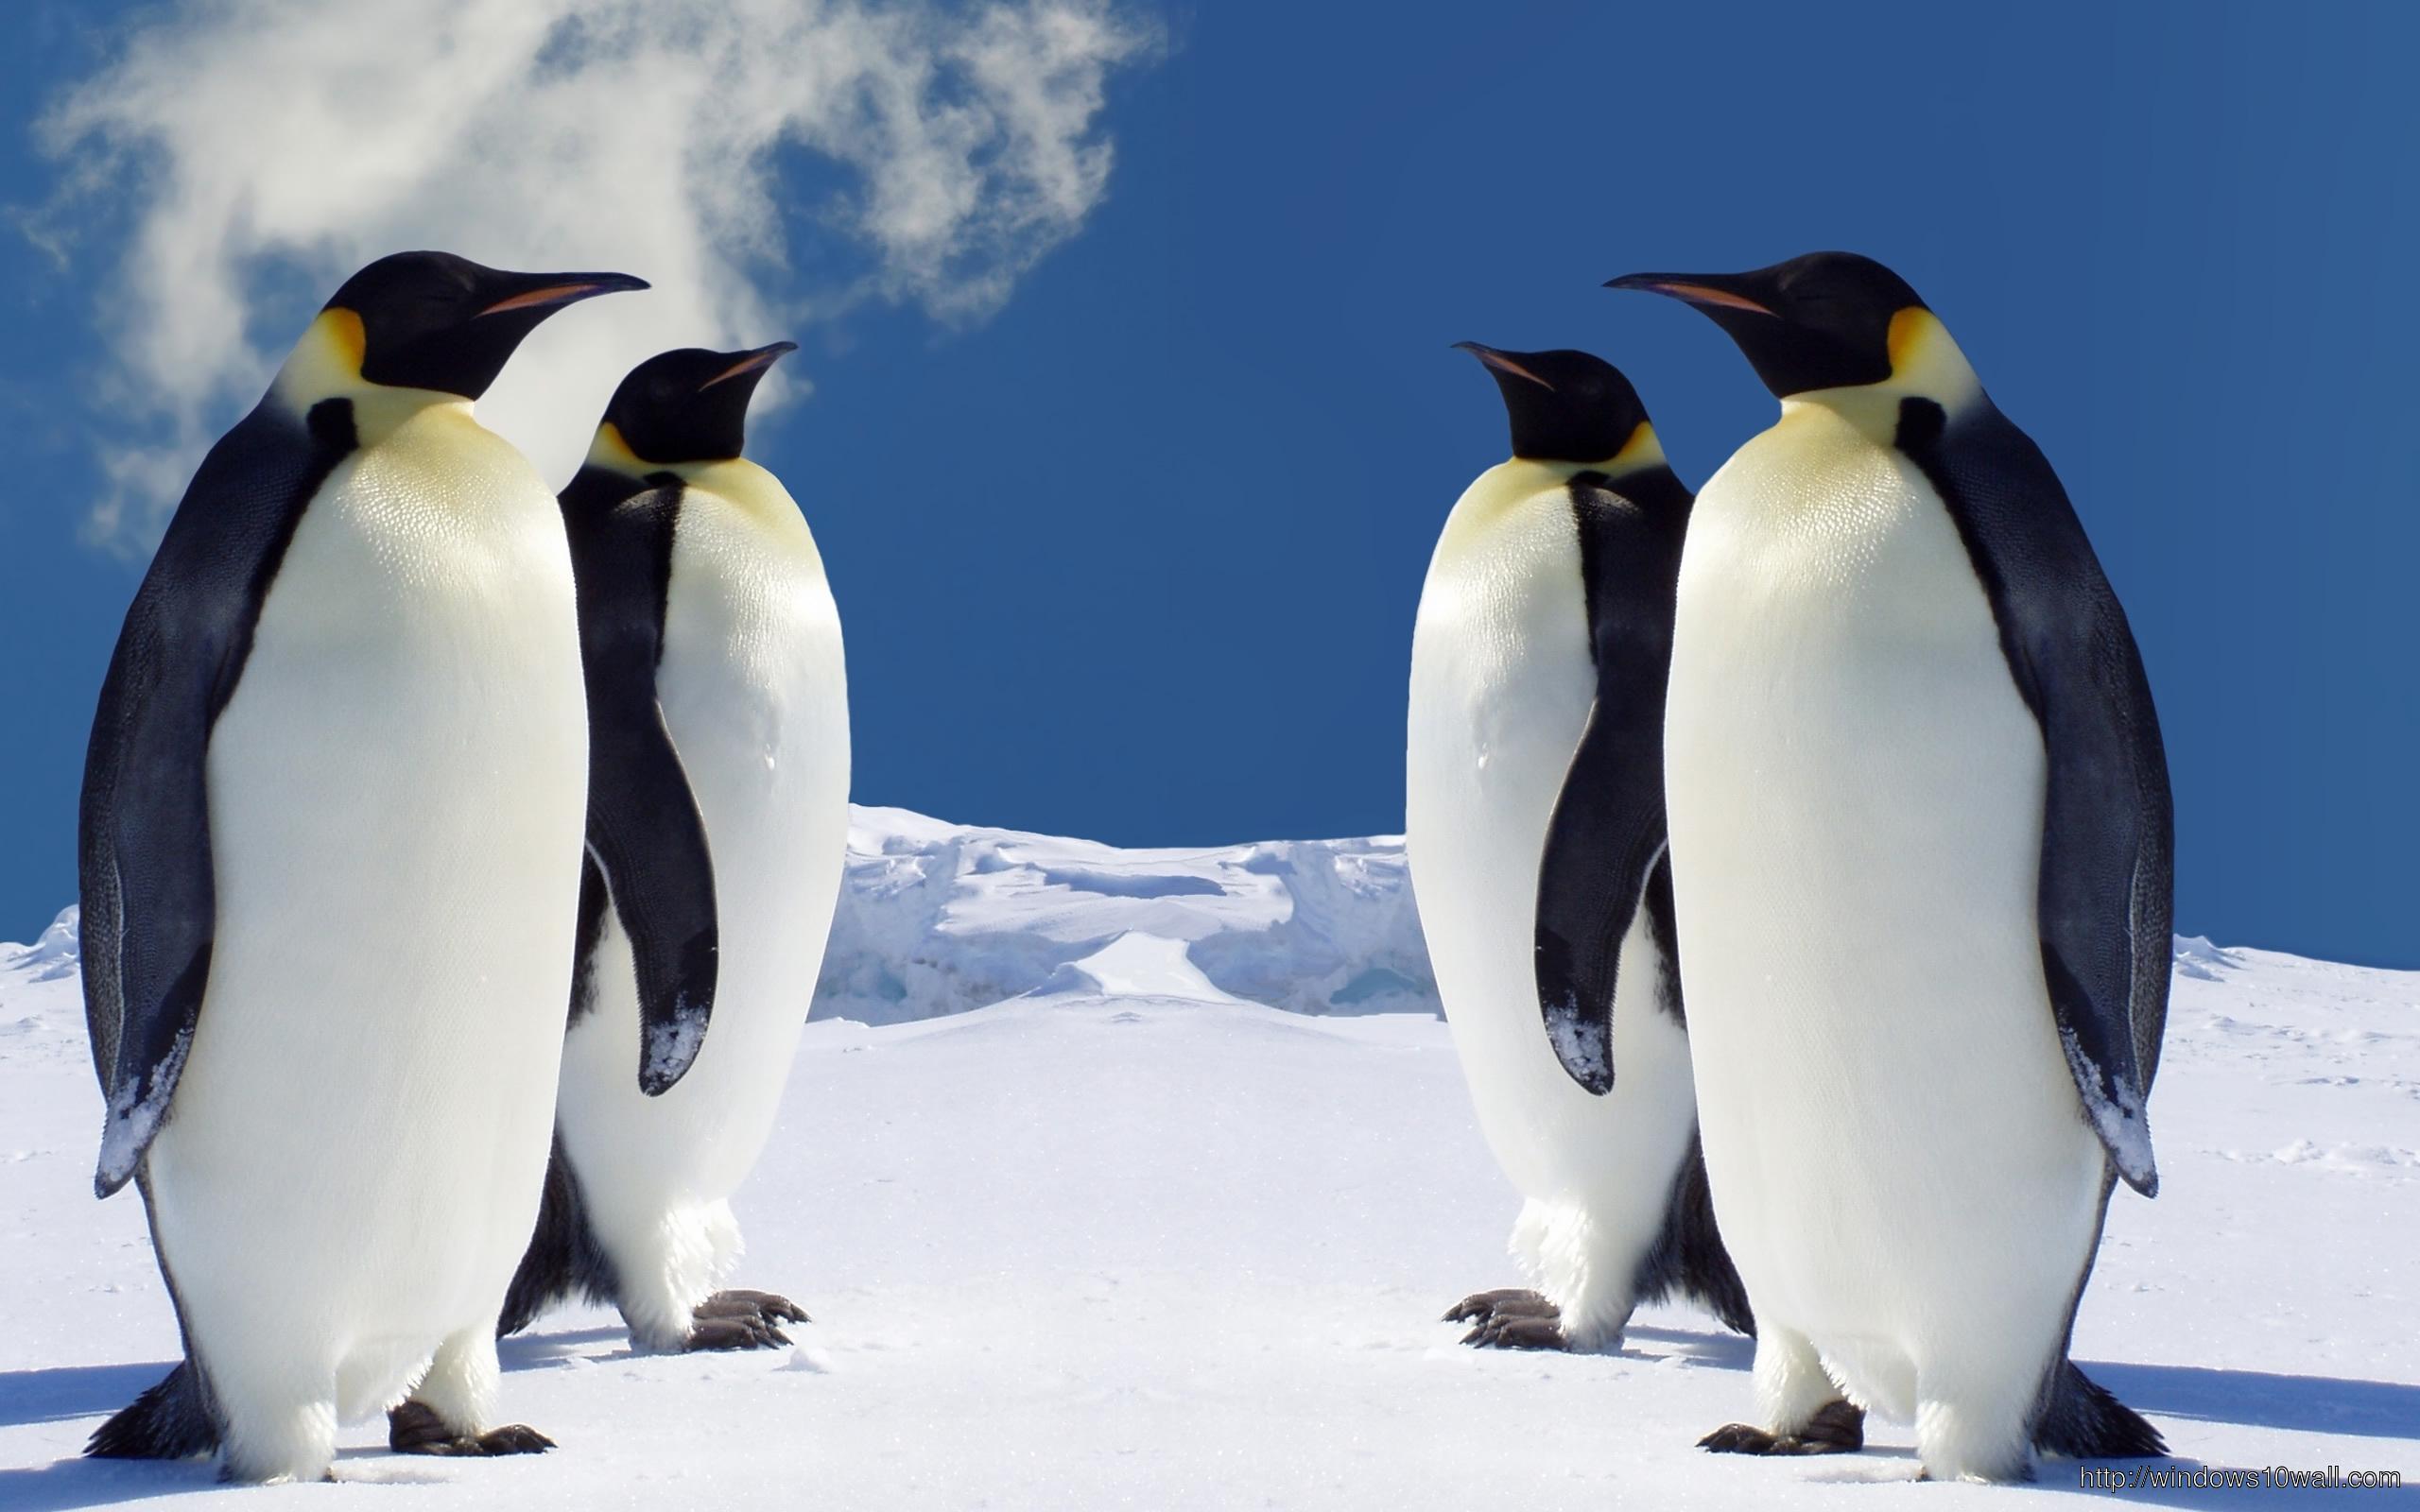 Spongebob Quotes Iphone Wallpaper Cute Penguins Picture Windows 10 Wallpapers